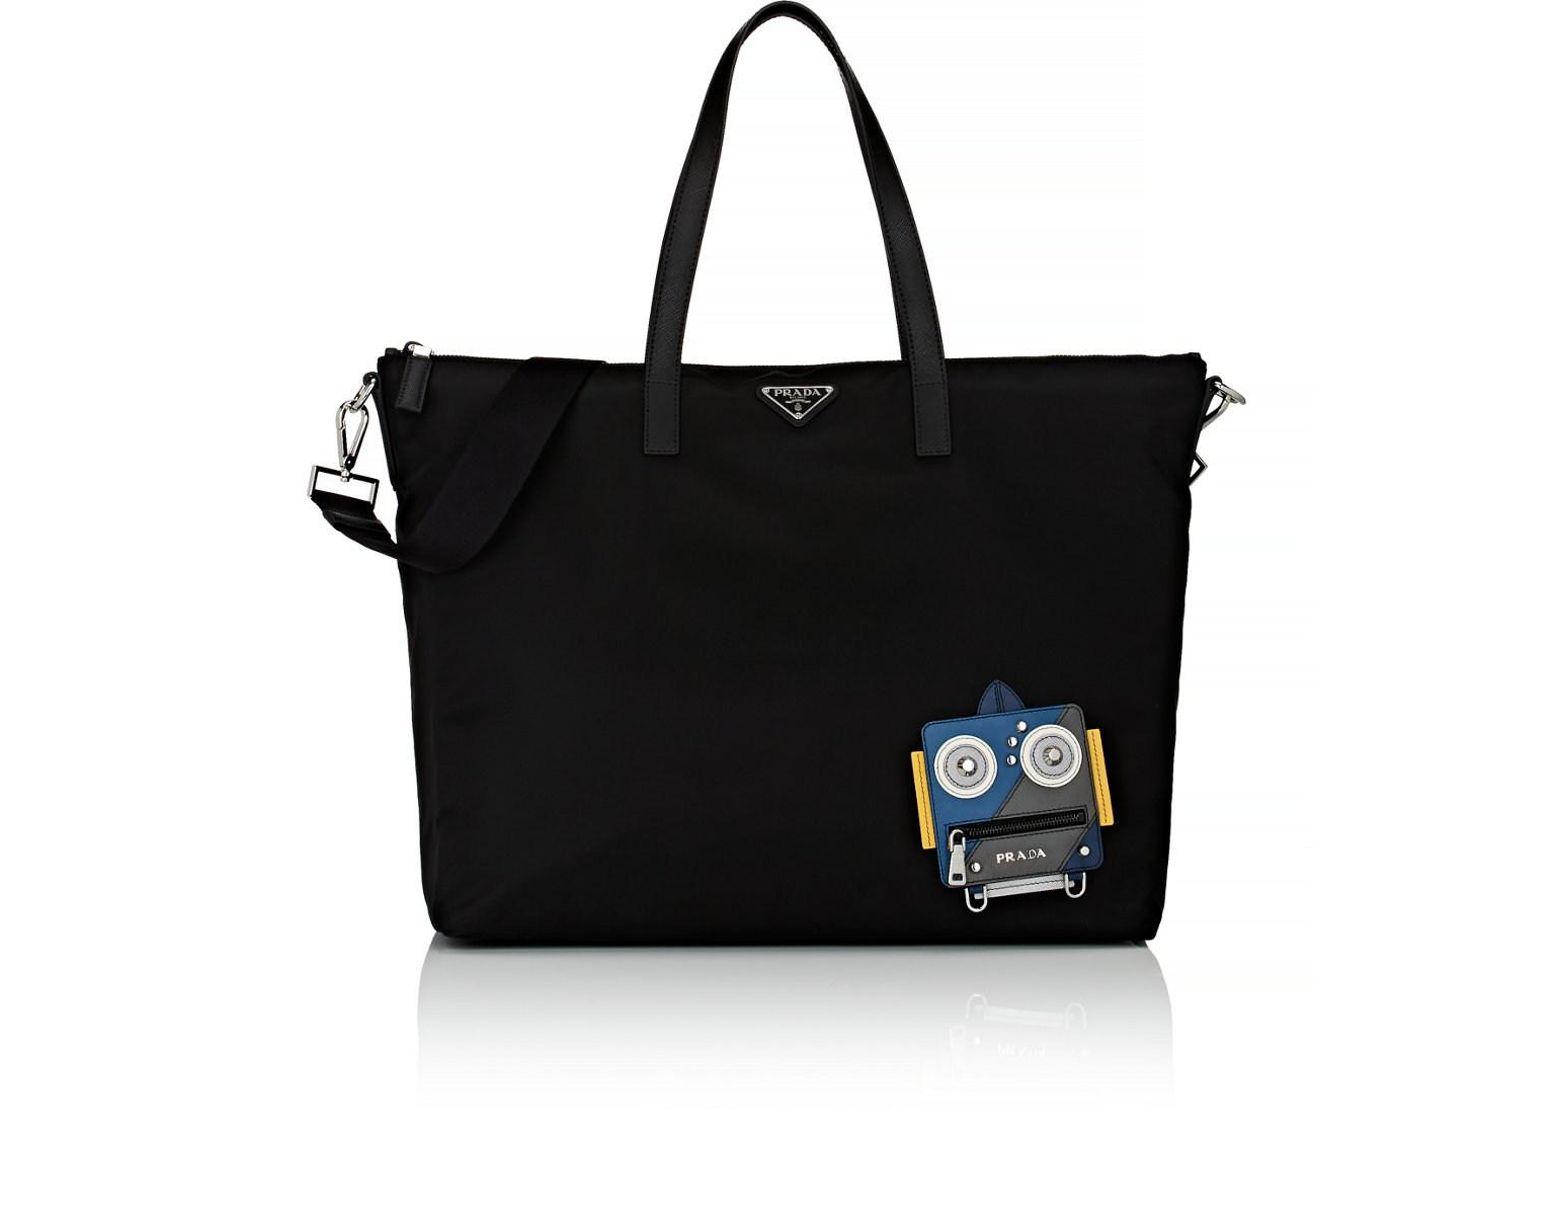 6267db0fac224c Prada Robot Tote Bag in Black for Men - Lyst